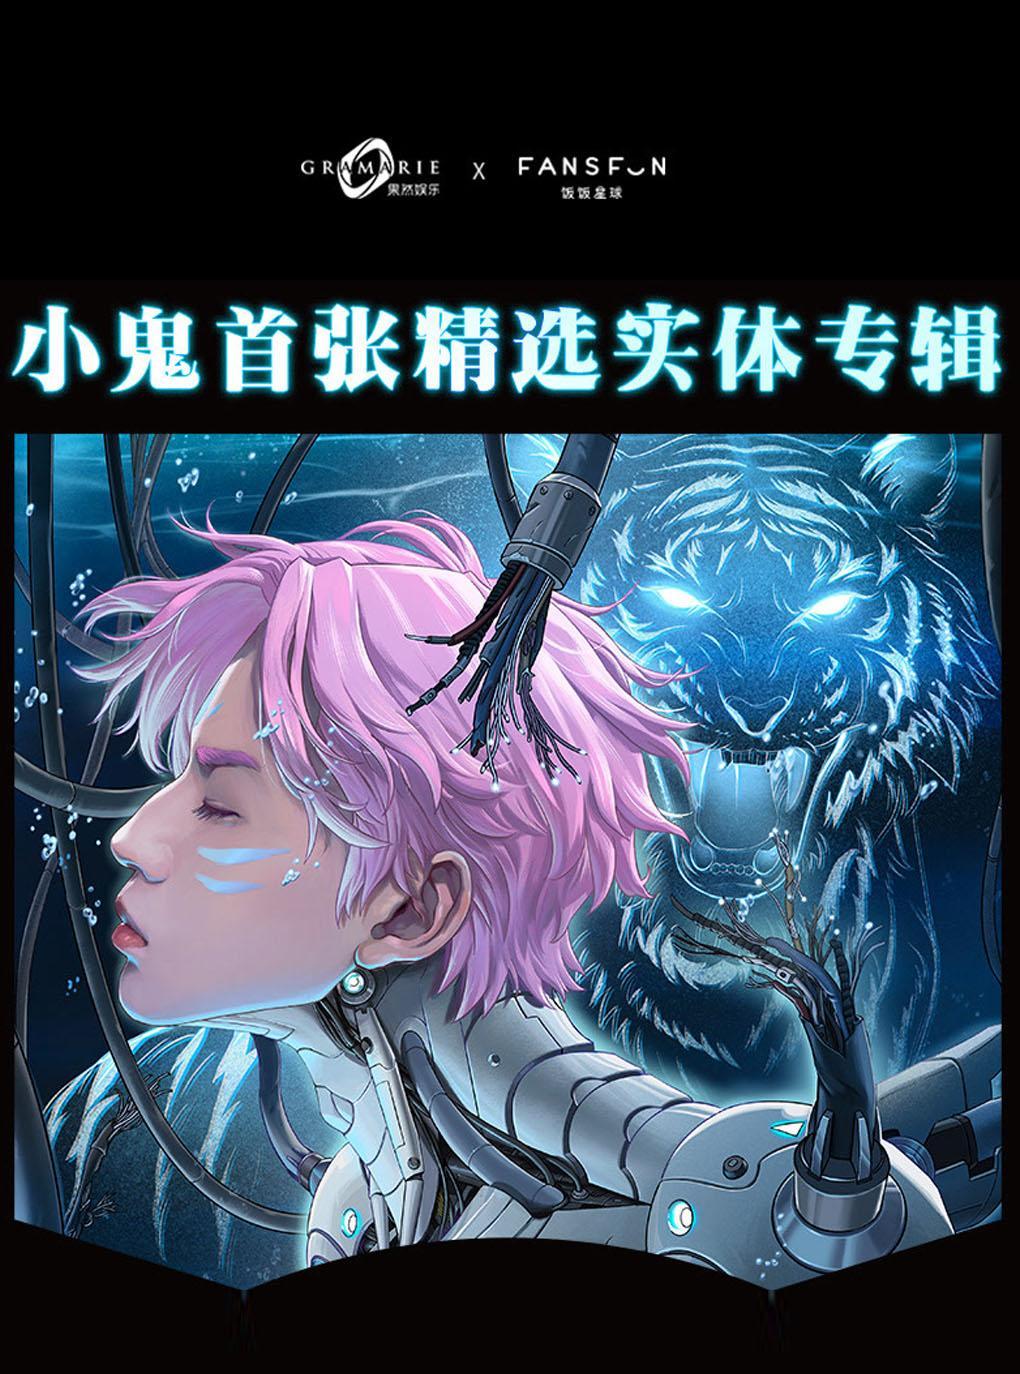 【Lil Ghost 2.0】小鬼专辑